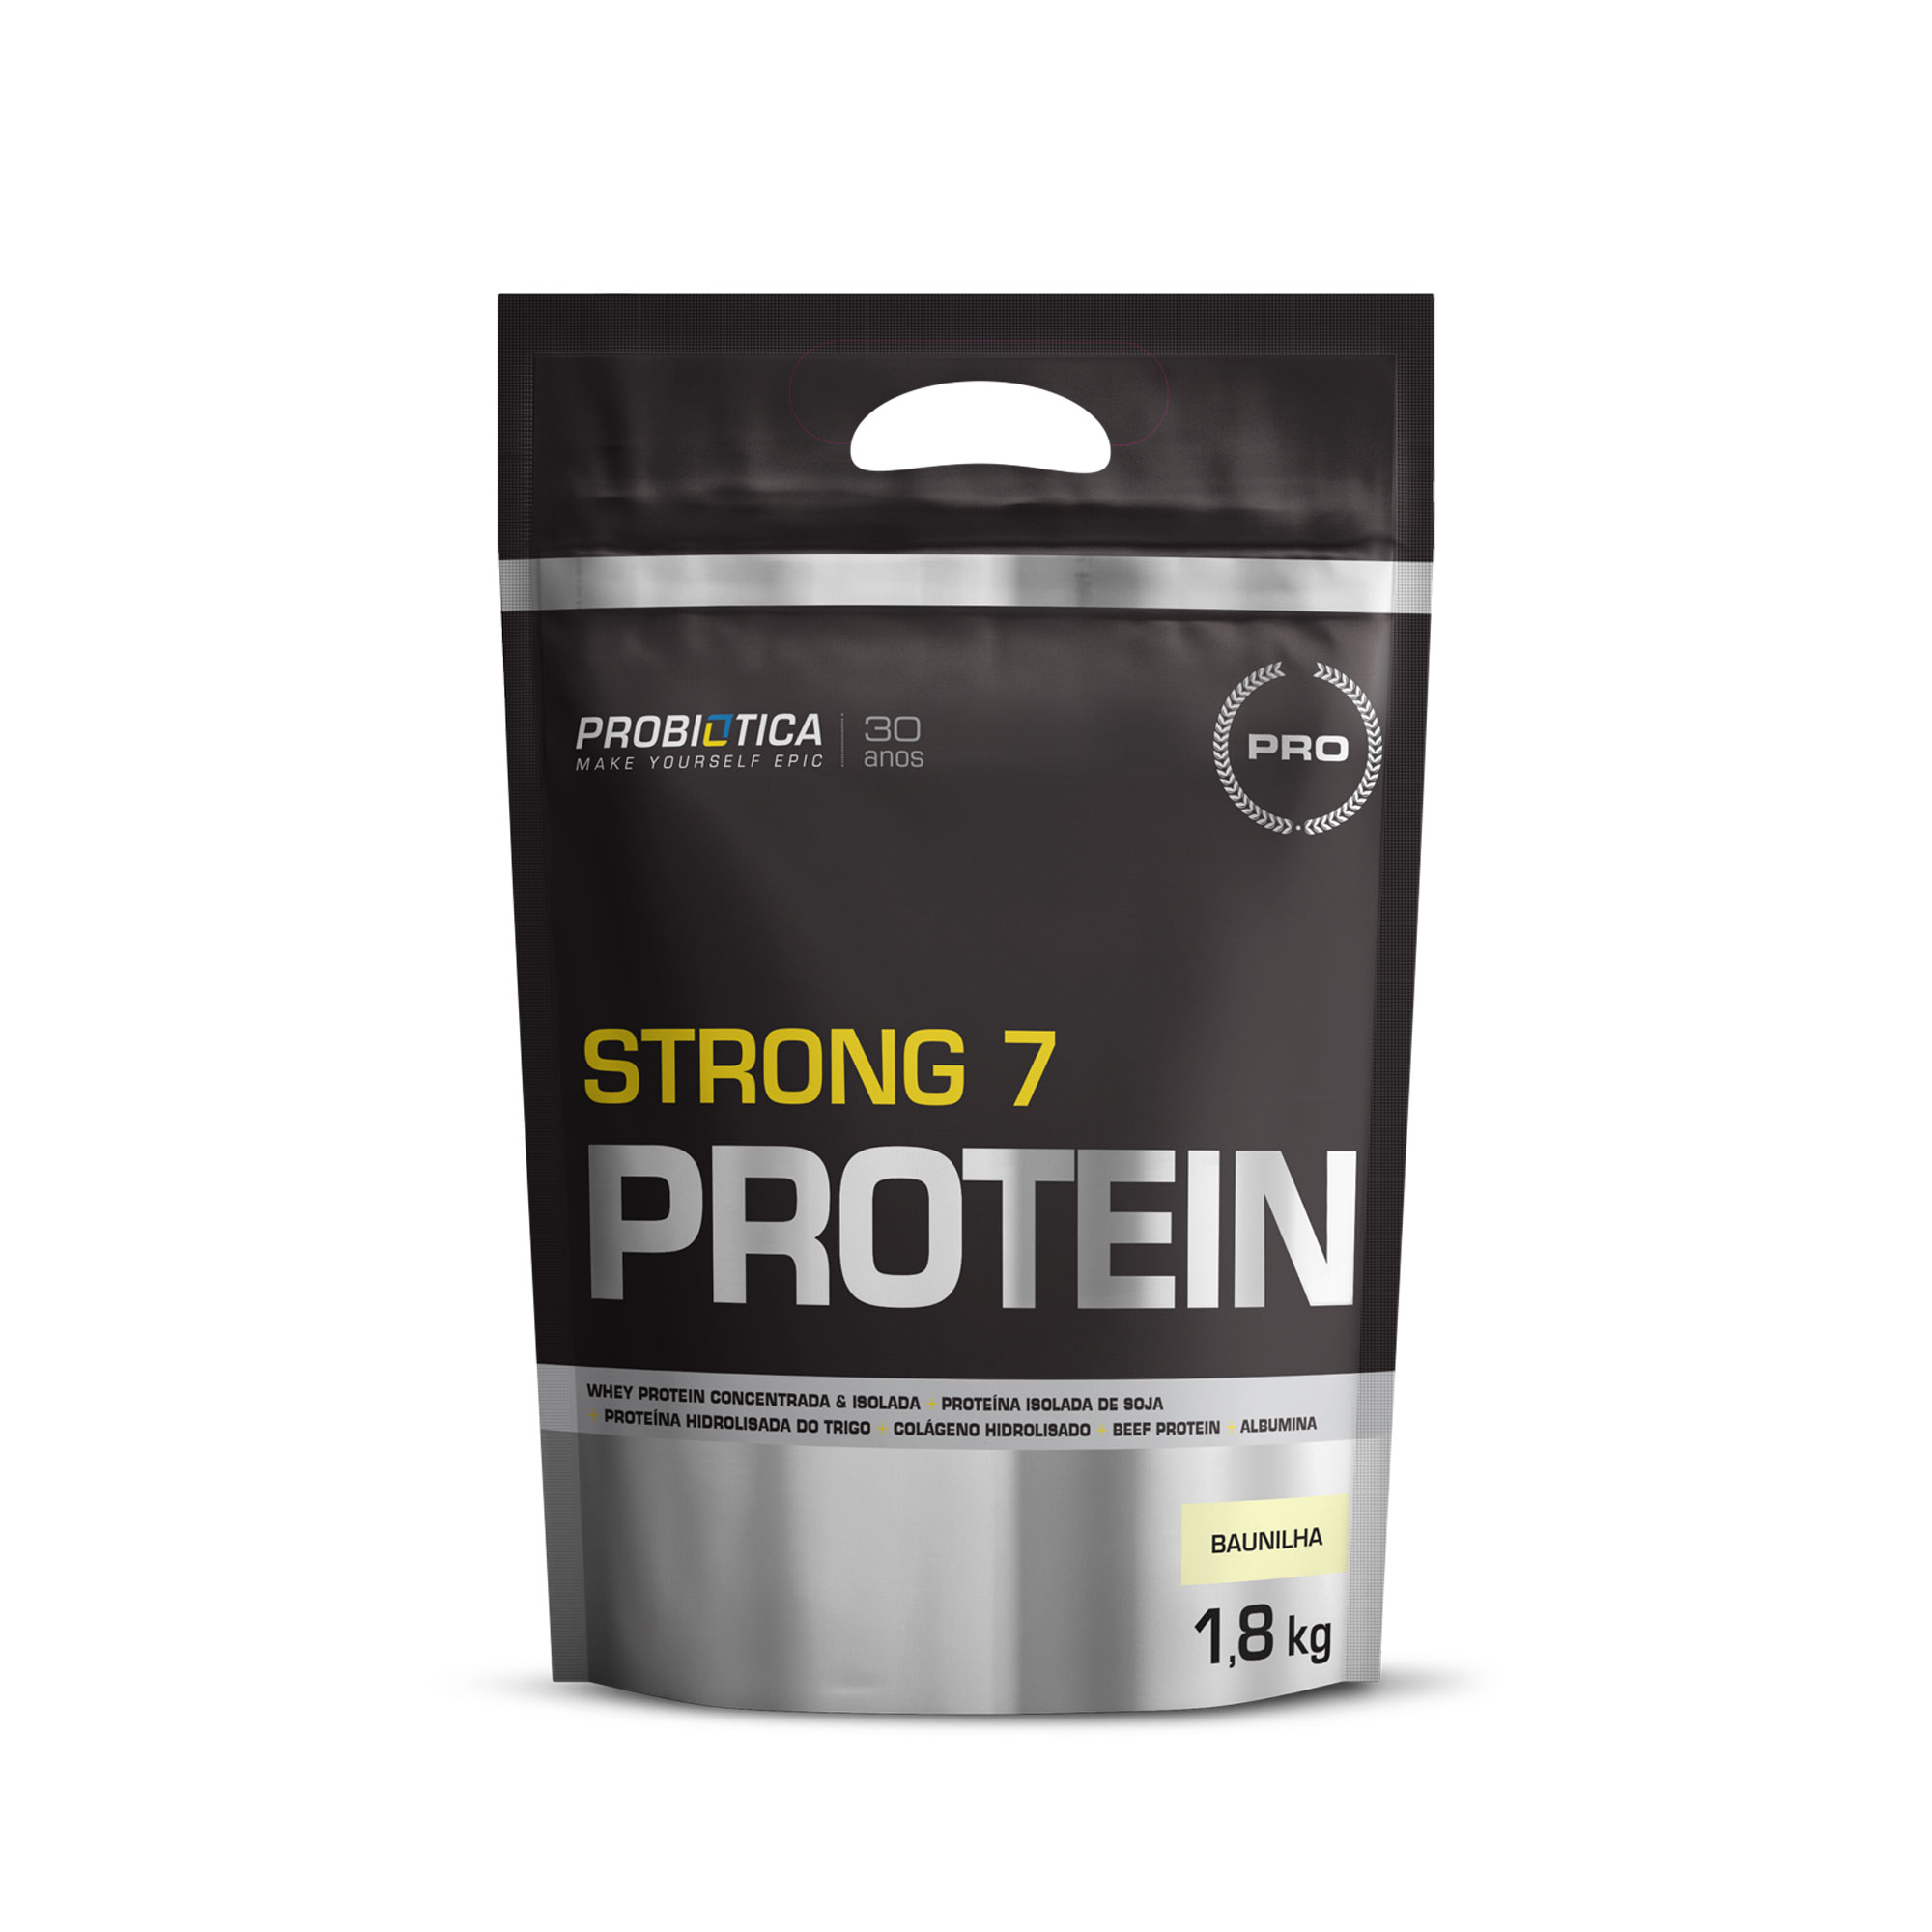 Strong 7 Protein Refil Baunilha Probiotica  1,8kg